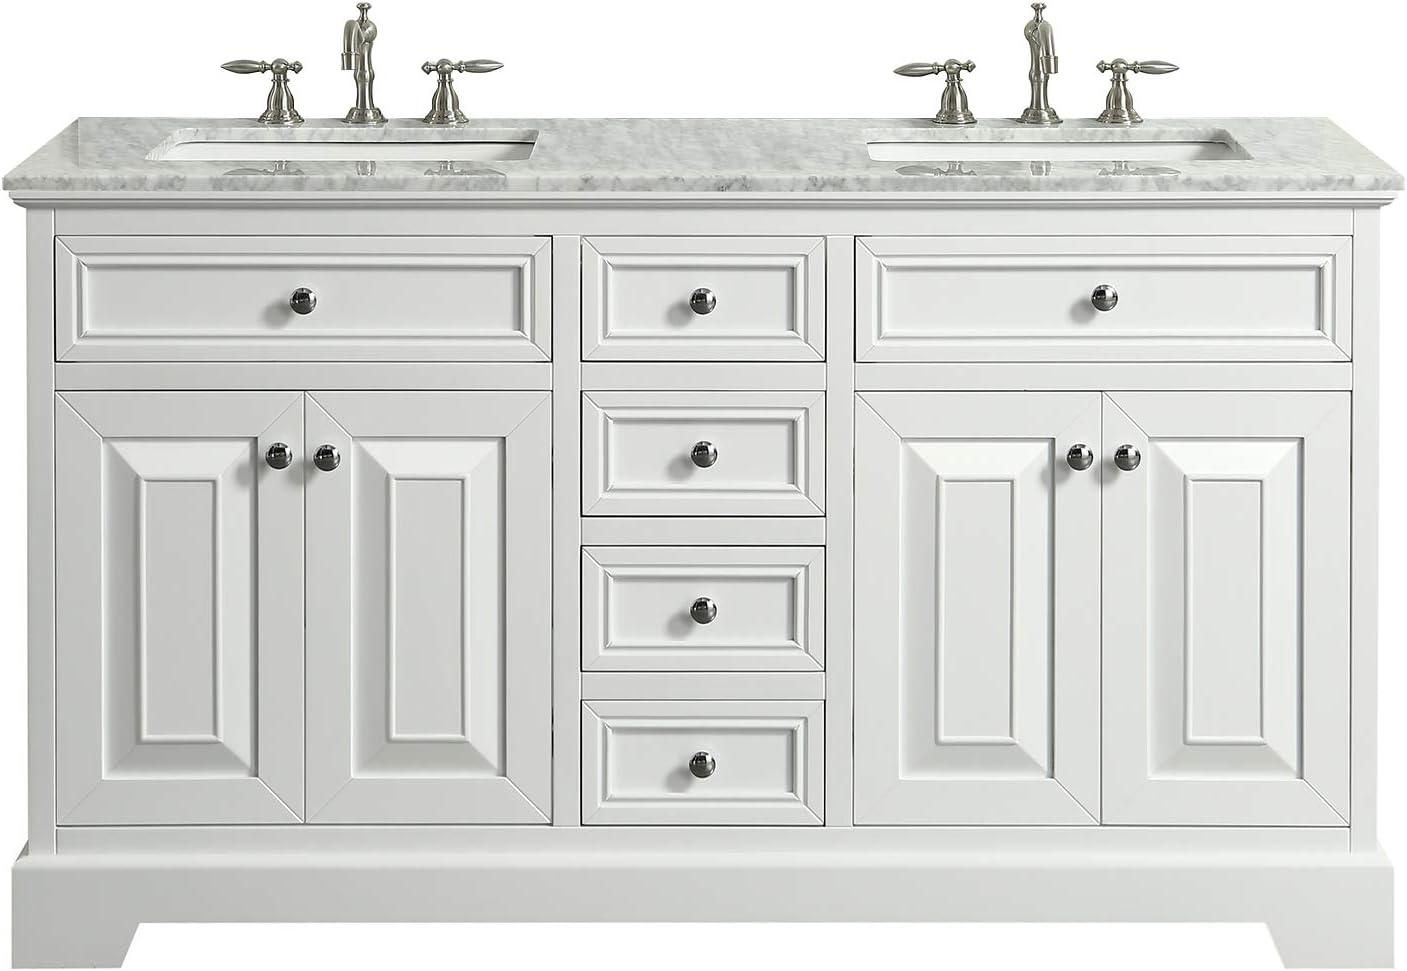 Amazon Com Eviva Monroe 72 Double Sink Wood Bathroom Vanity With Carrara Top In White Furniture Decor